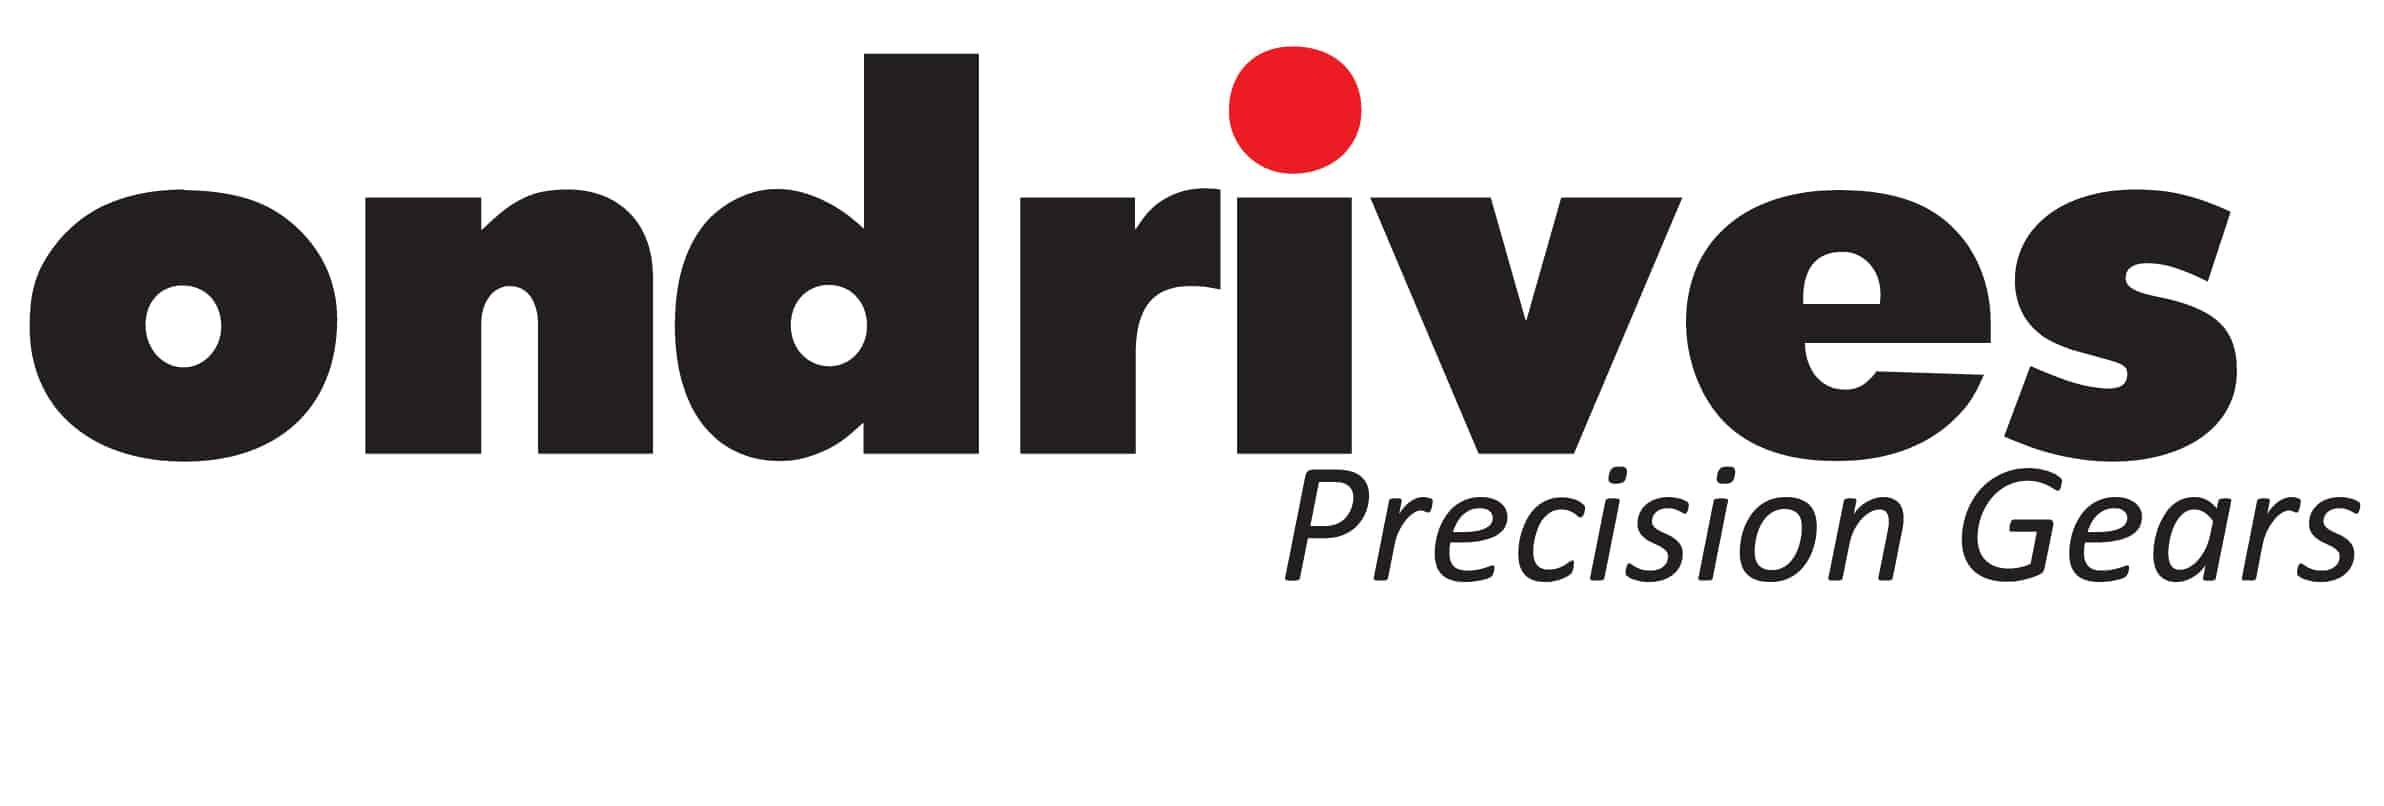 Ondrives Logo Precision Gears 2020 WEB